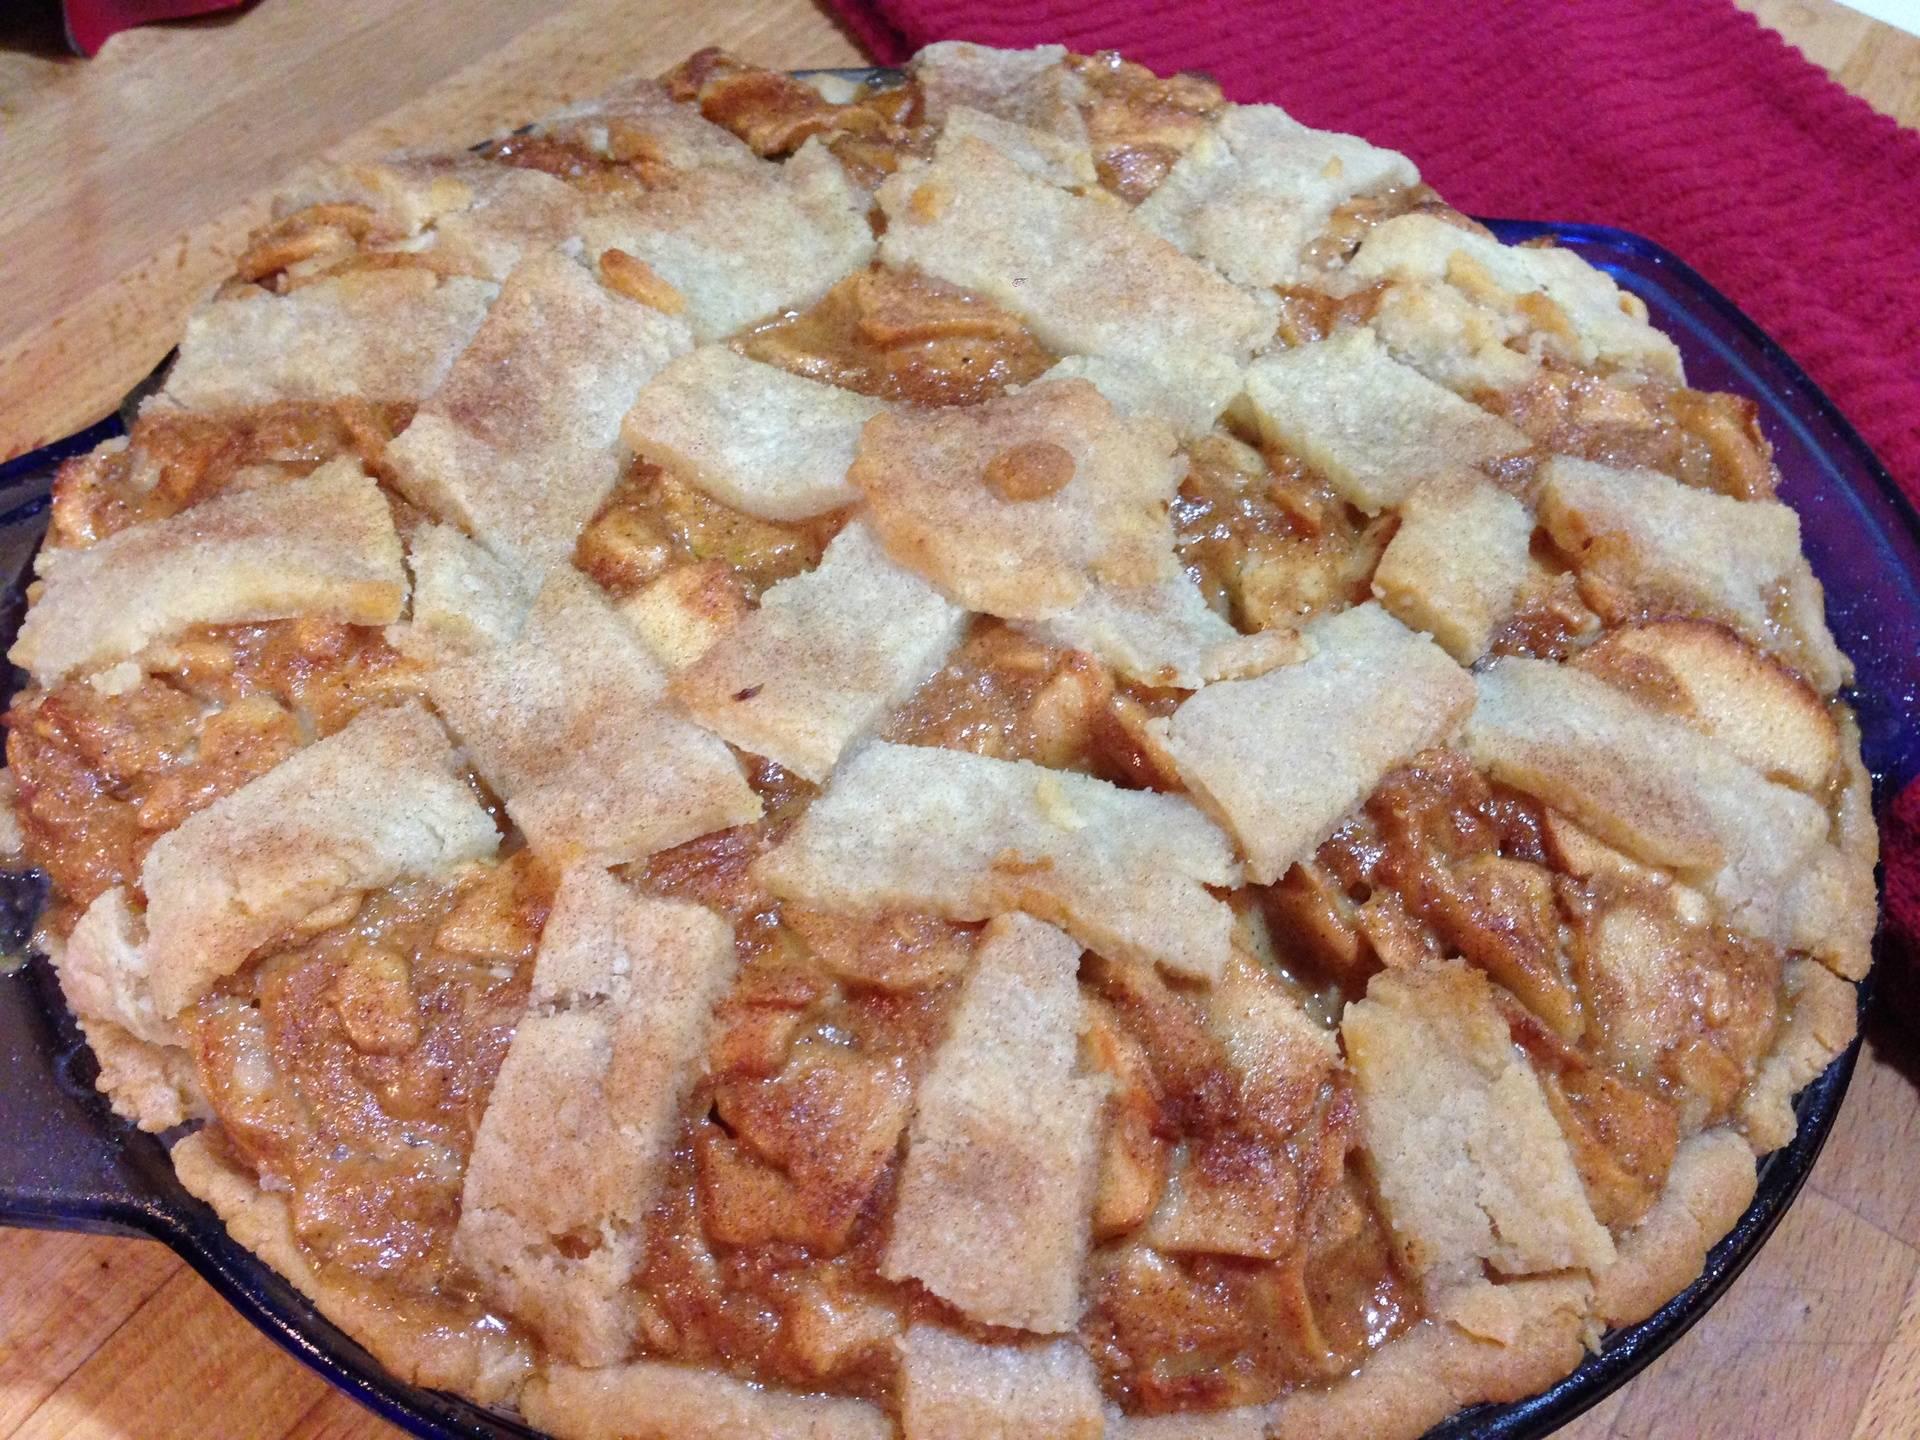 GF Mascarpone Caramel Apple Pie